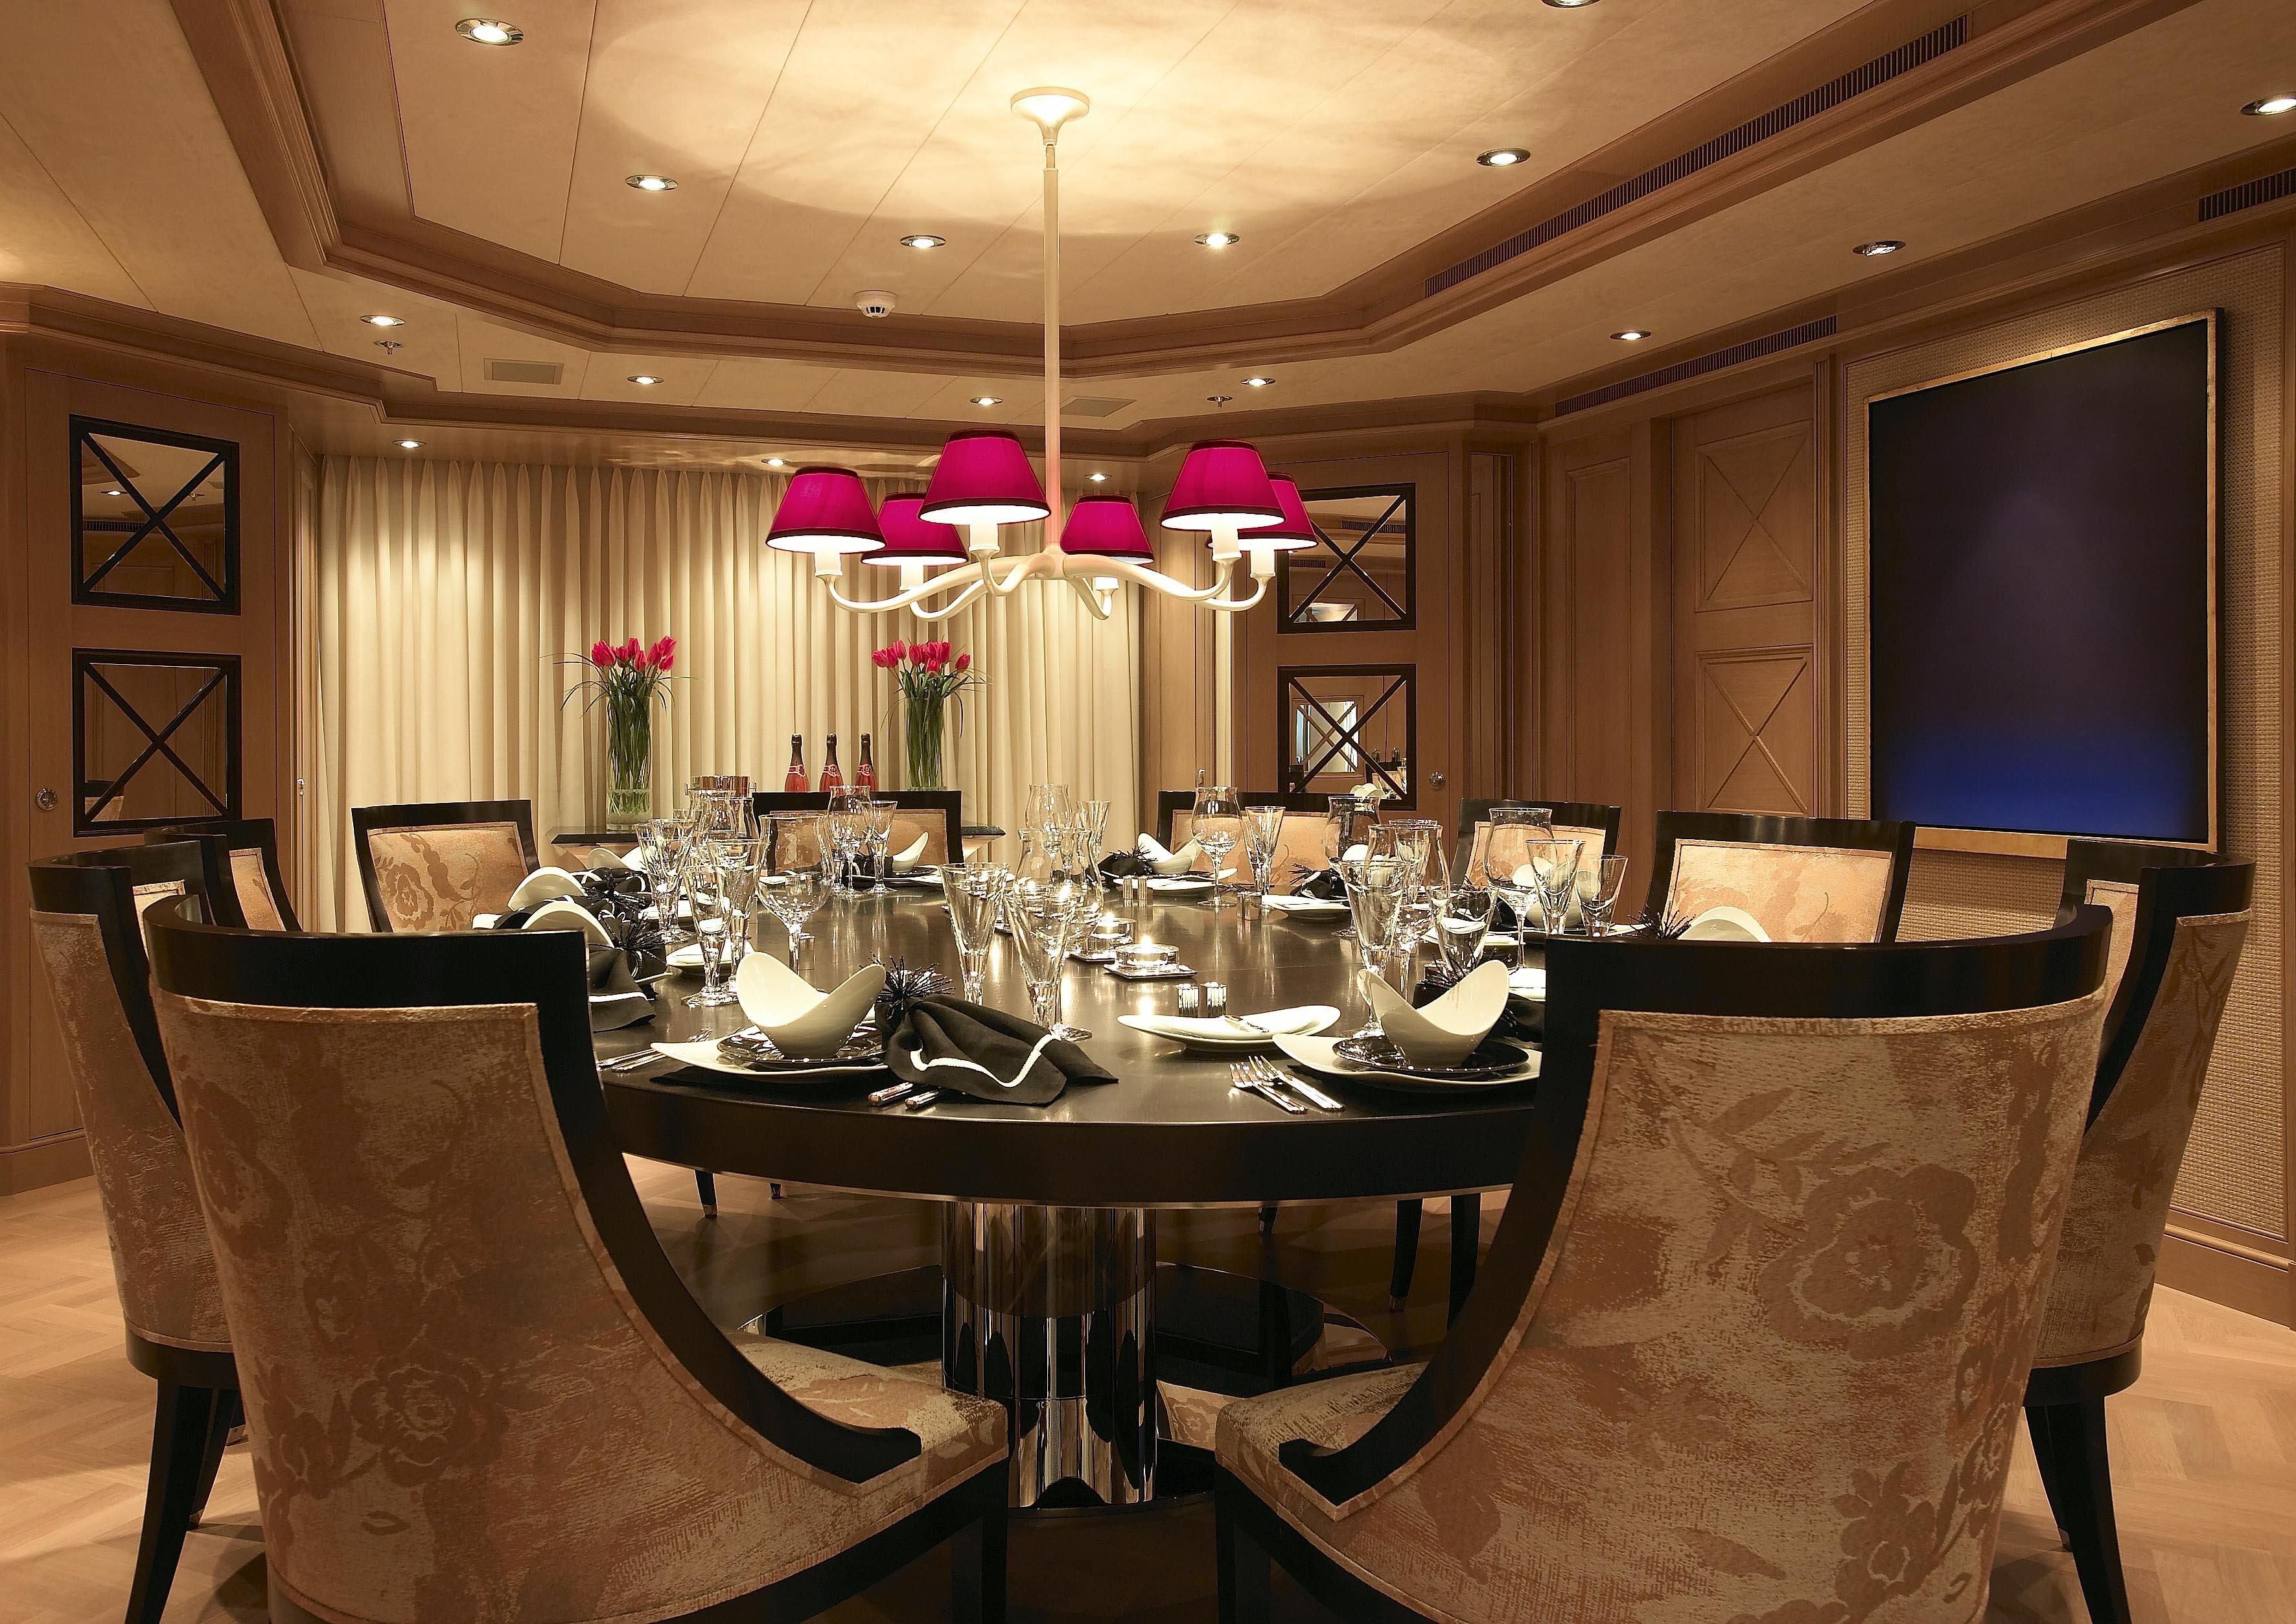 Dining Room Decoration 12 Download Image House Interior Design